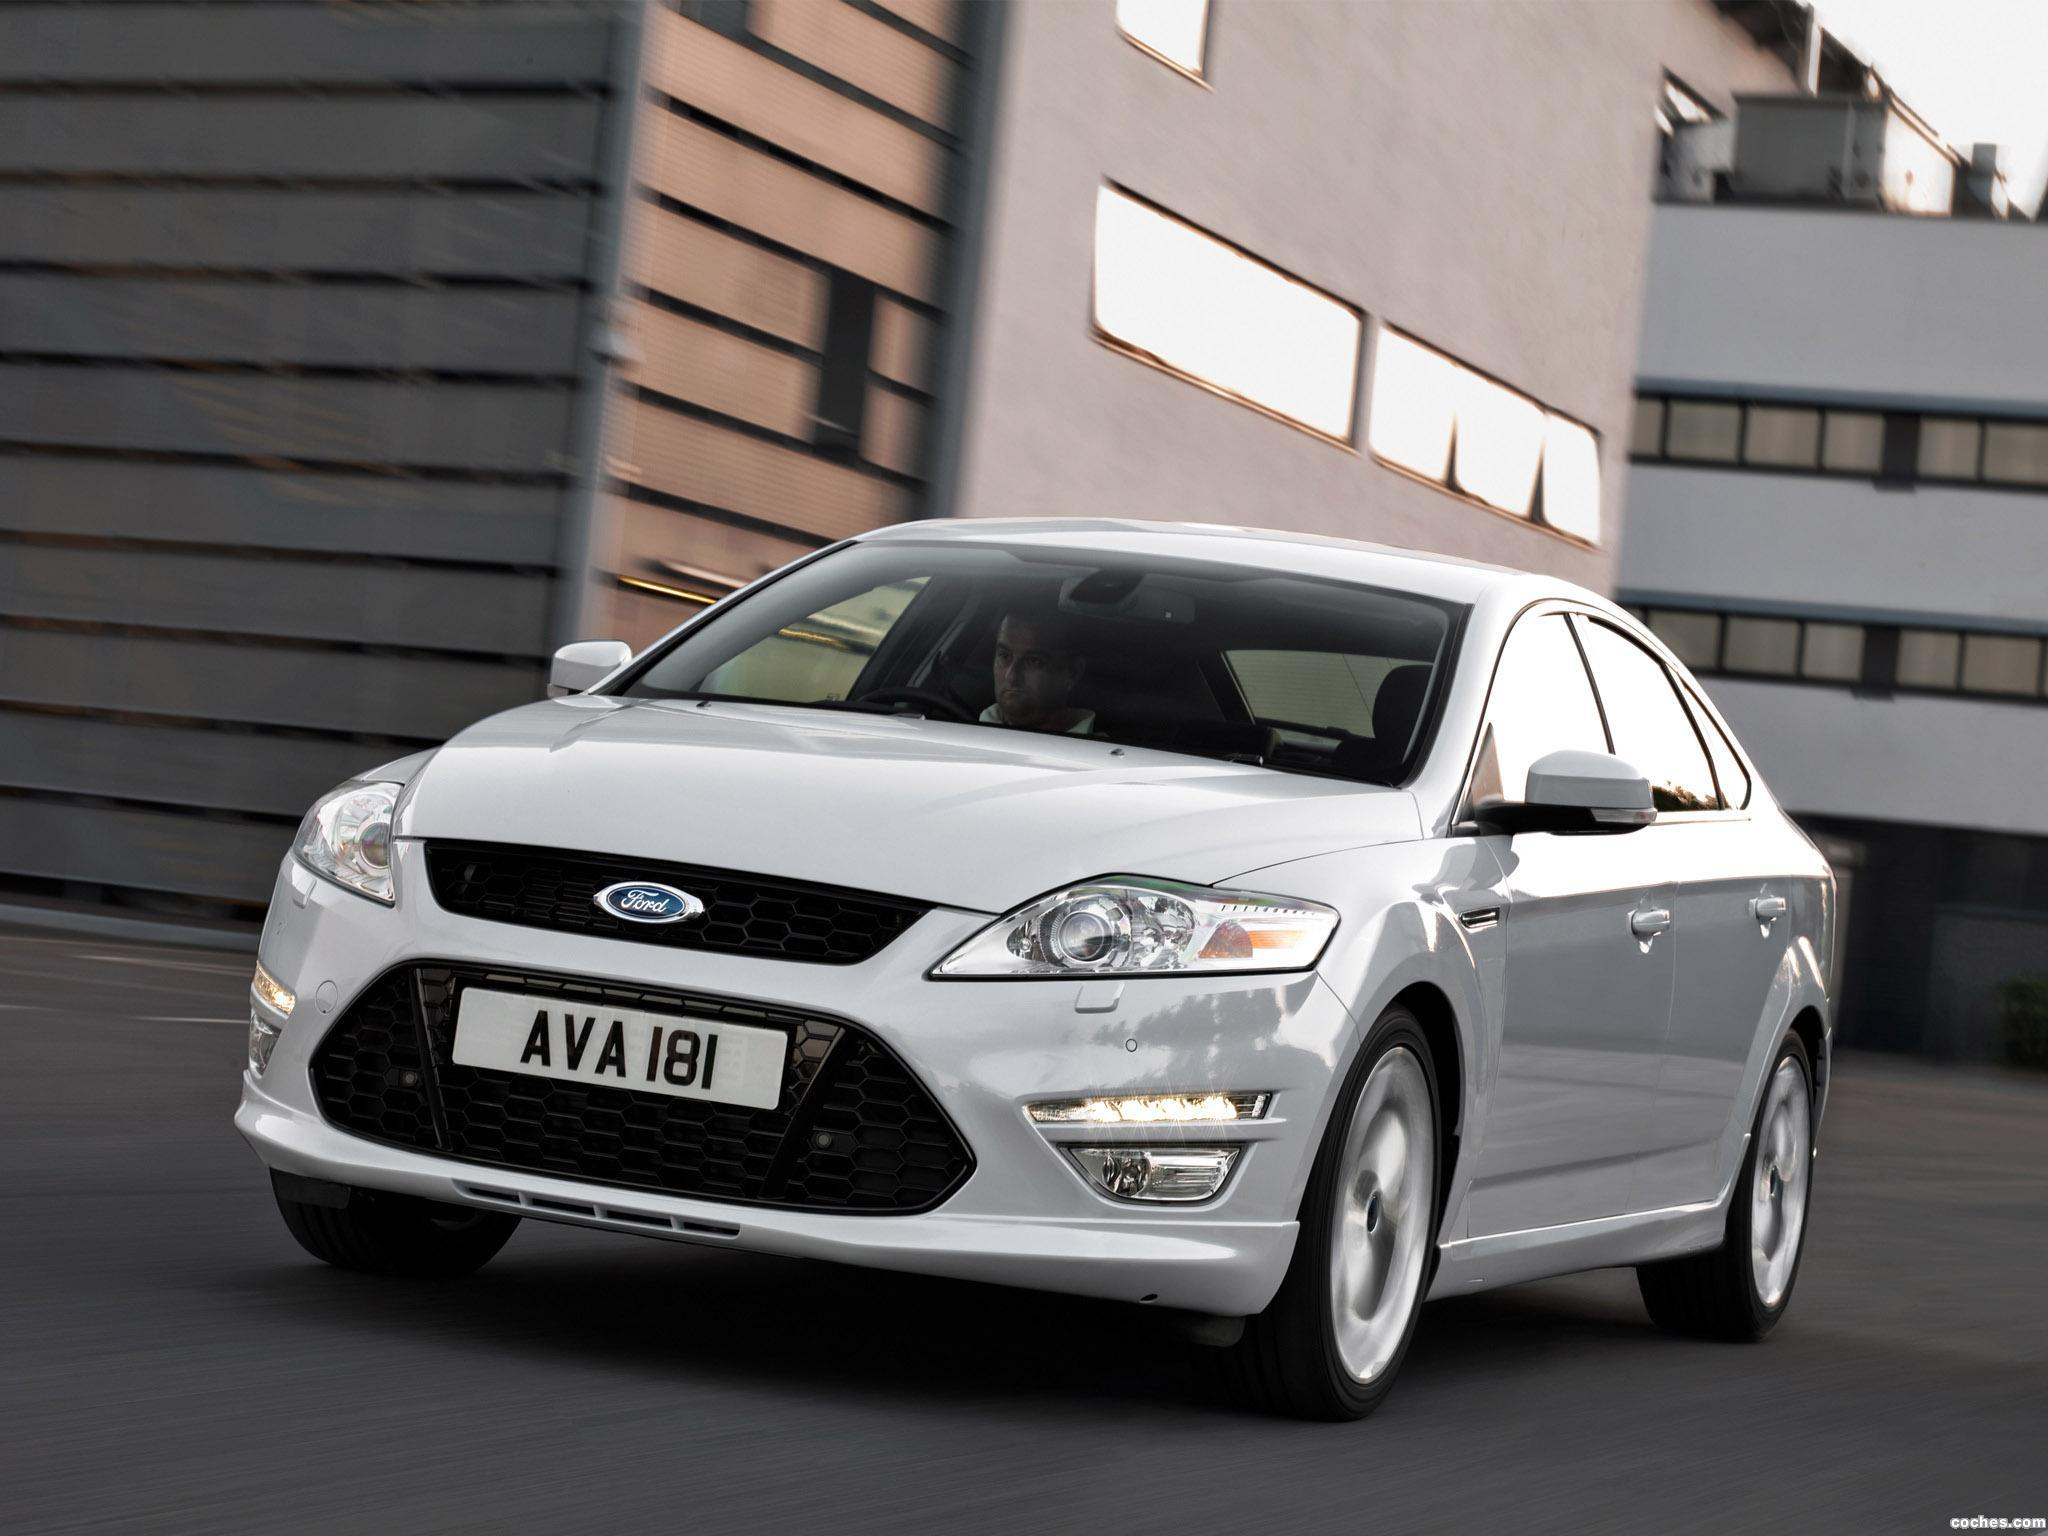 Foto 2 de Ford Mondeo 5 puertas Titanium-X 2010